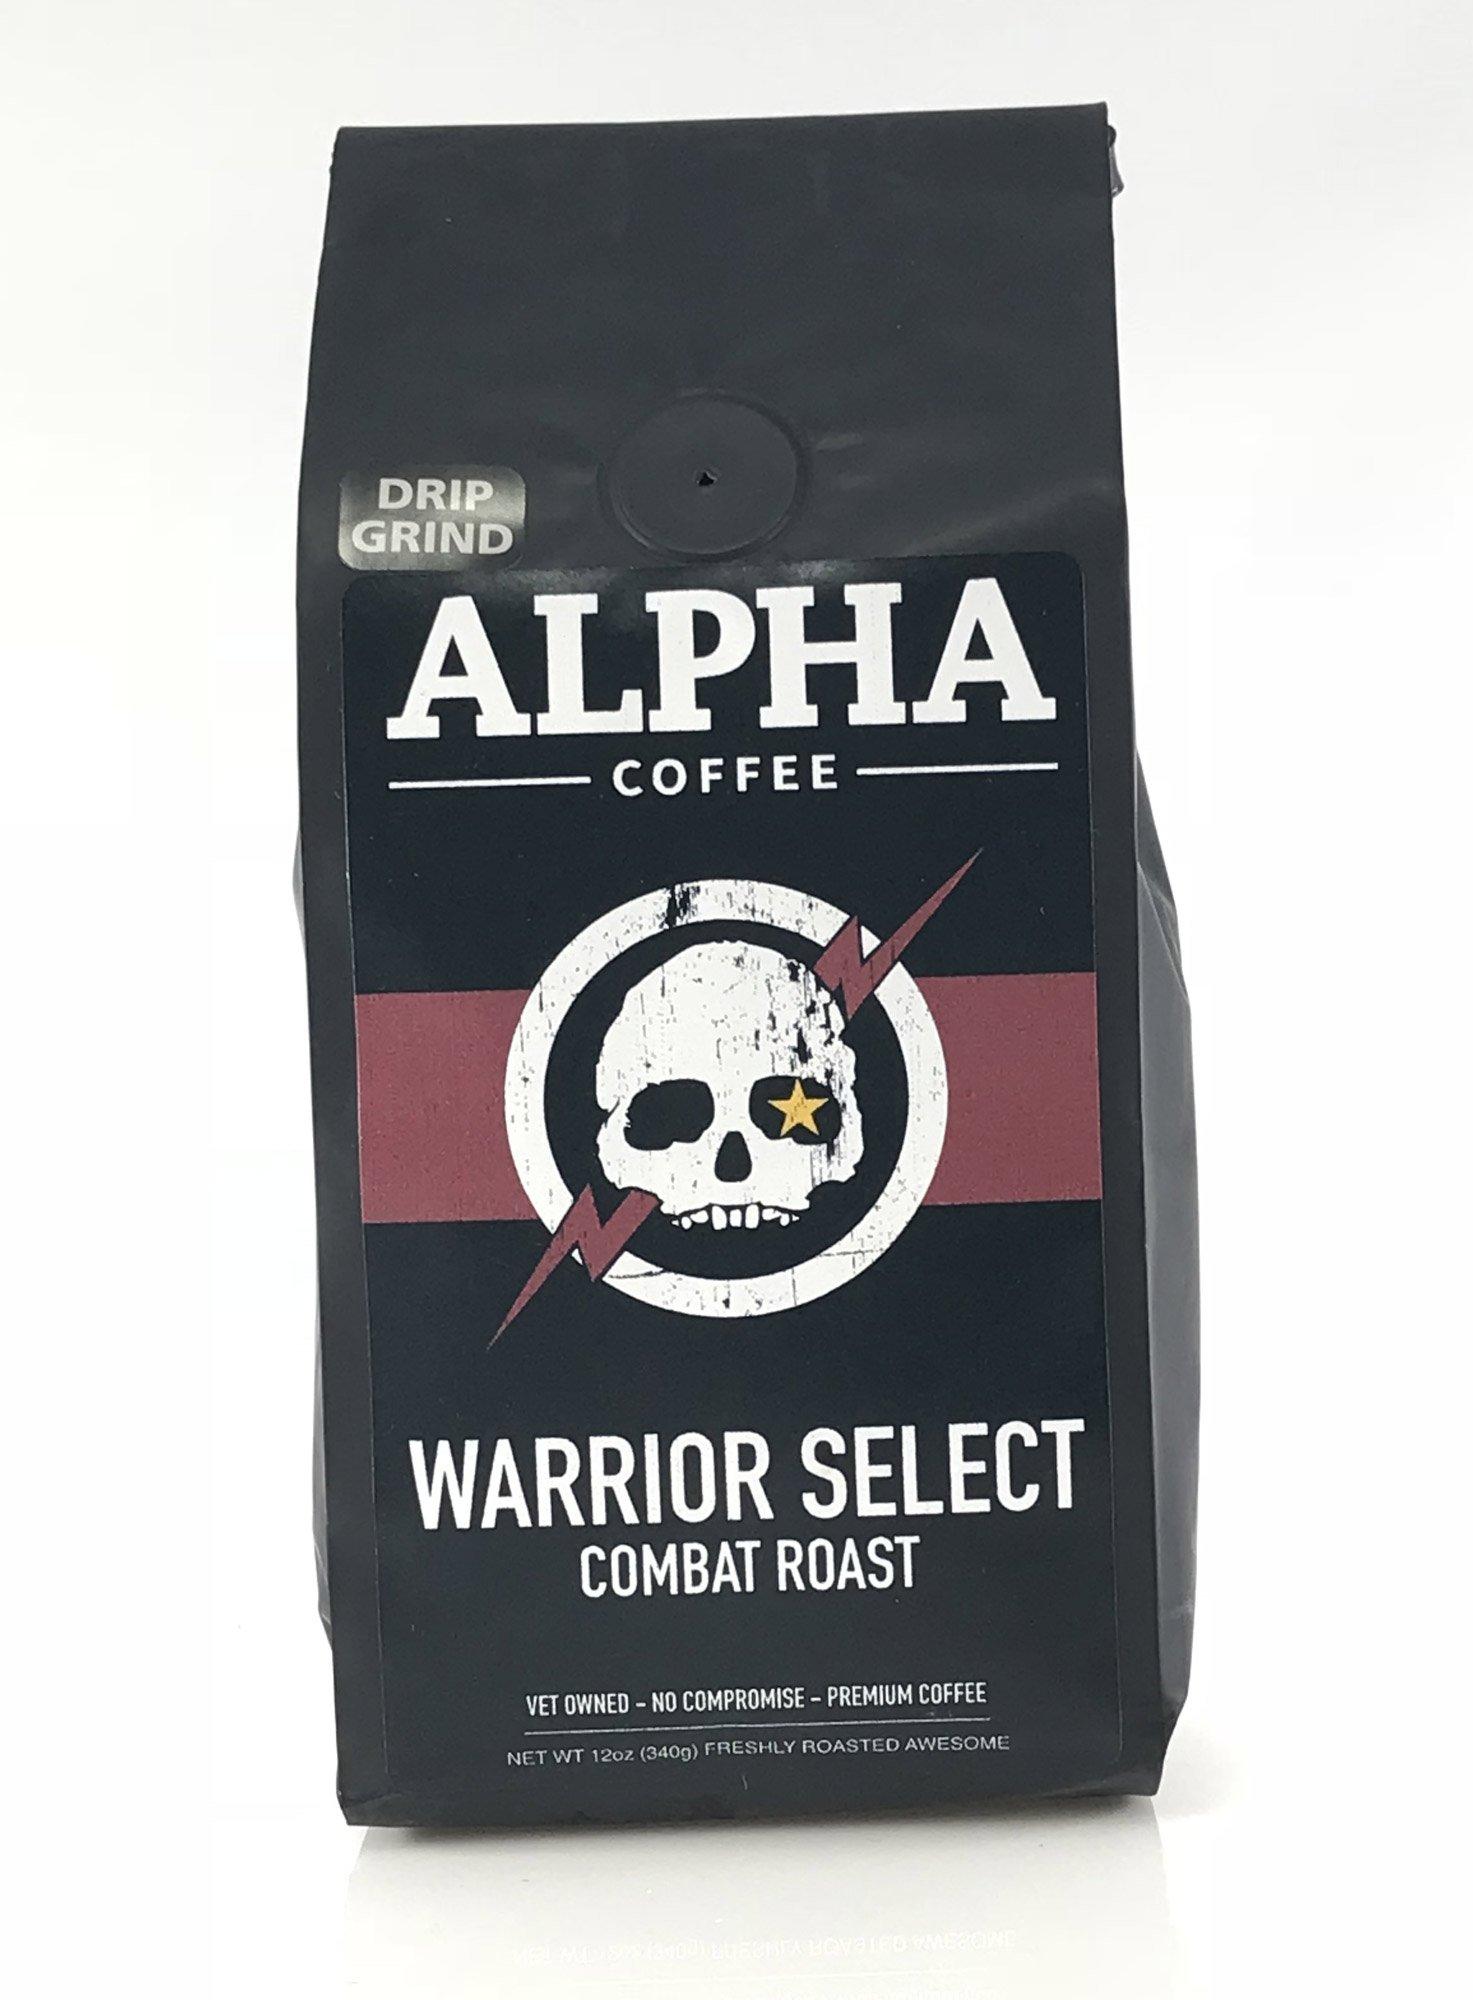 Alpha Coffee, Dark Roast Ground Coffee, 12 oz. Robust Warrior Select Combat Roast, 100% Arabica Coffee from Central America, Papua New Guinea